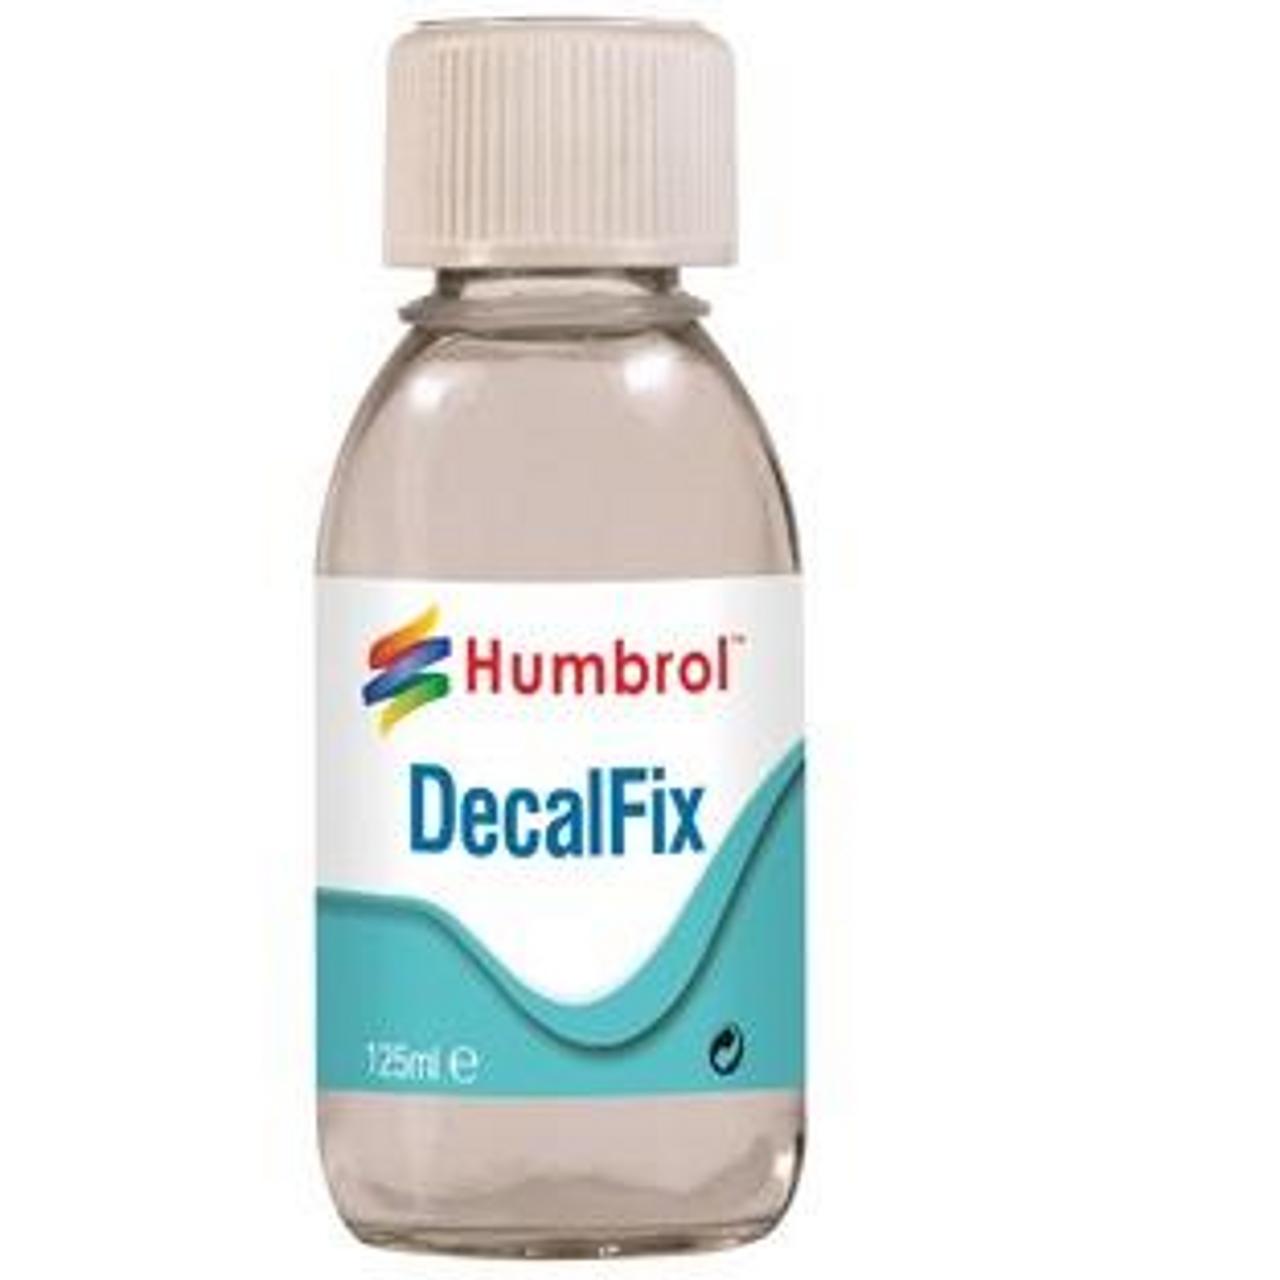 Humbrol AC7432 Decalfix 125ML